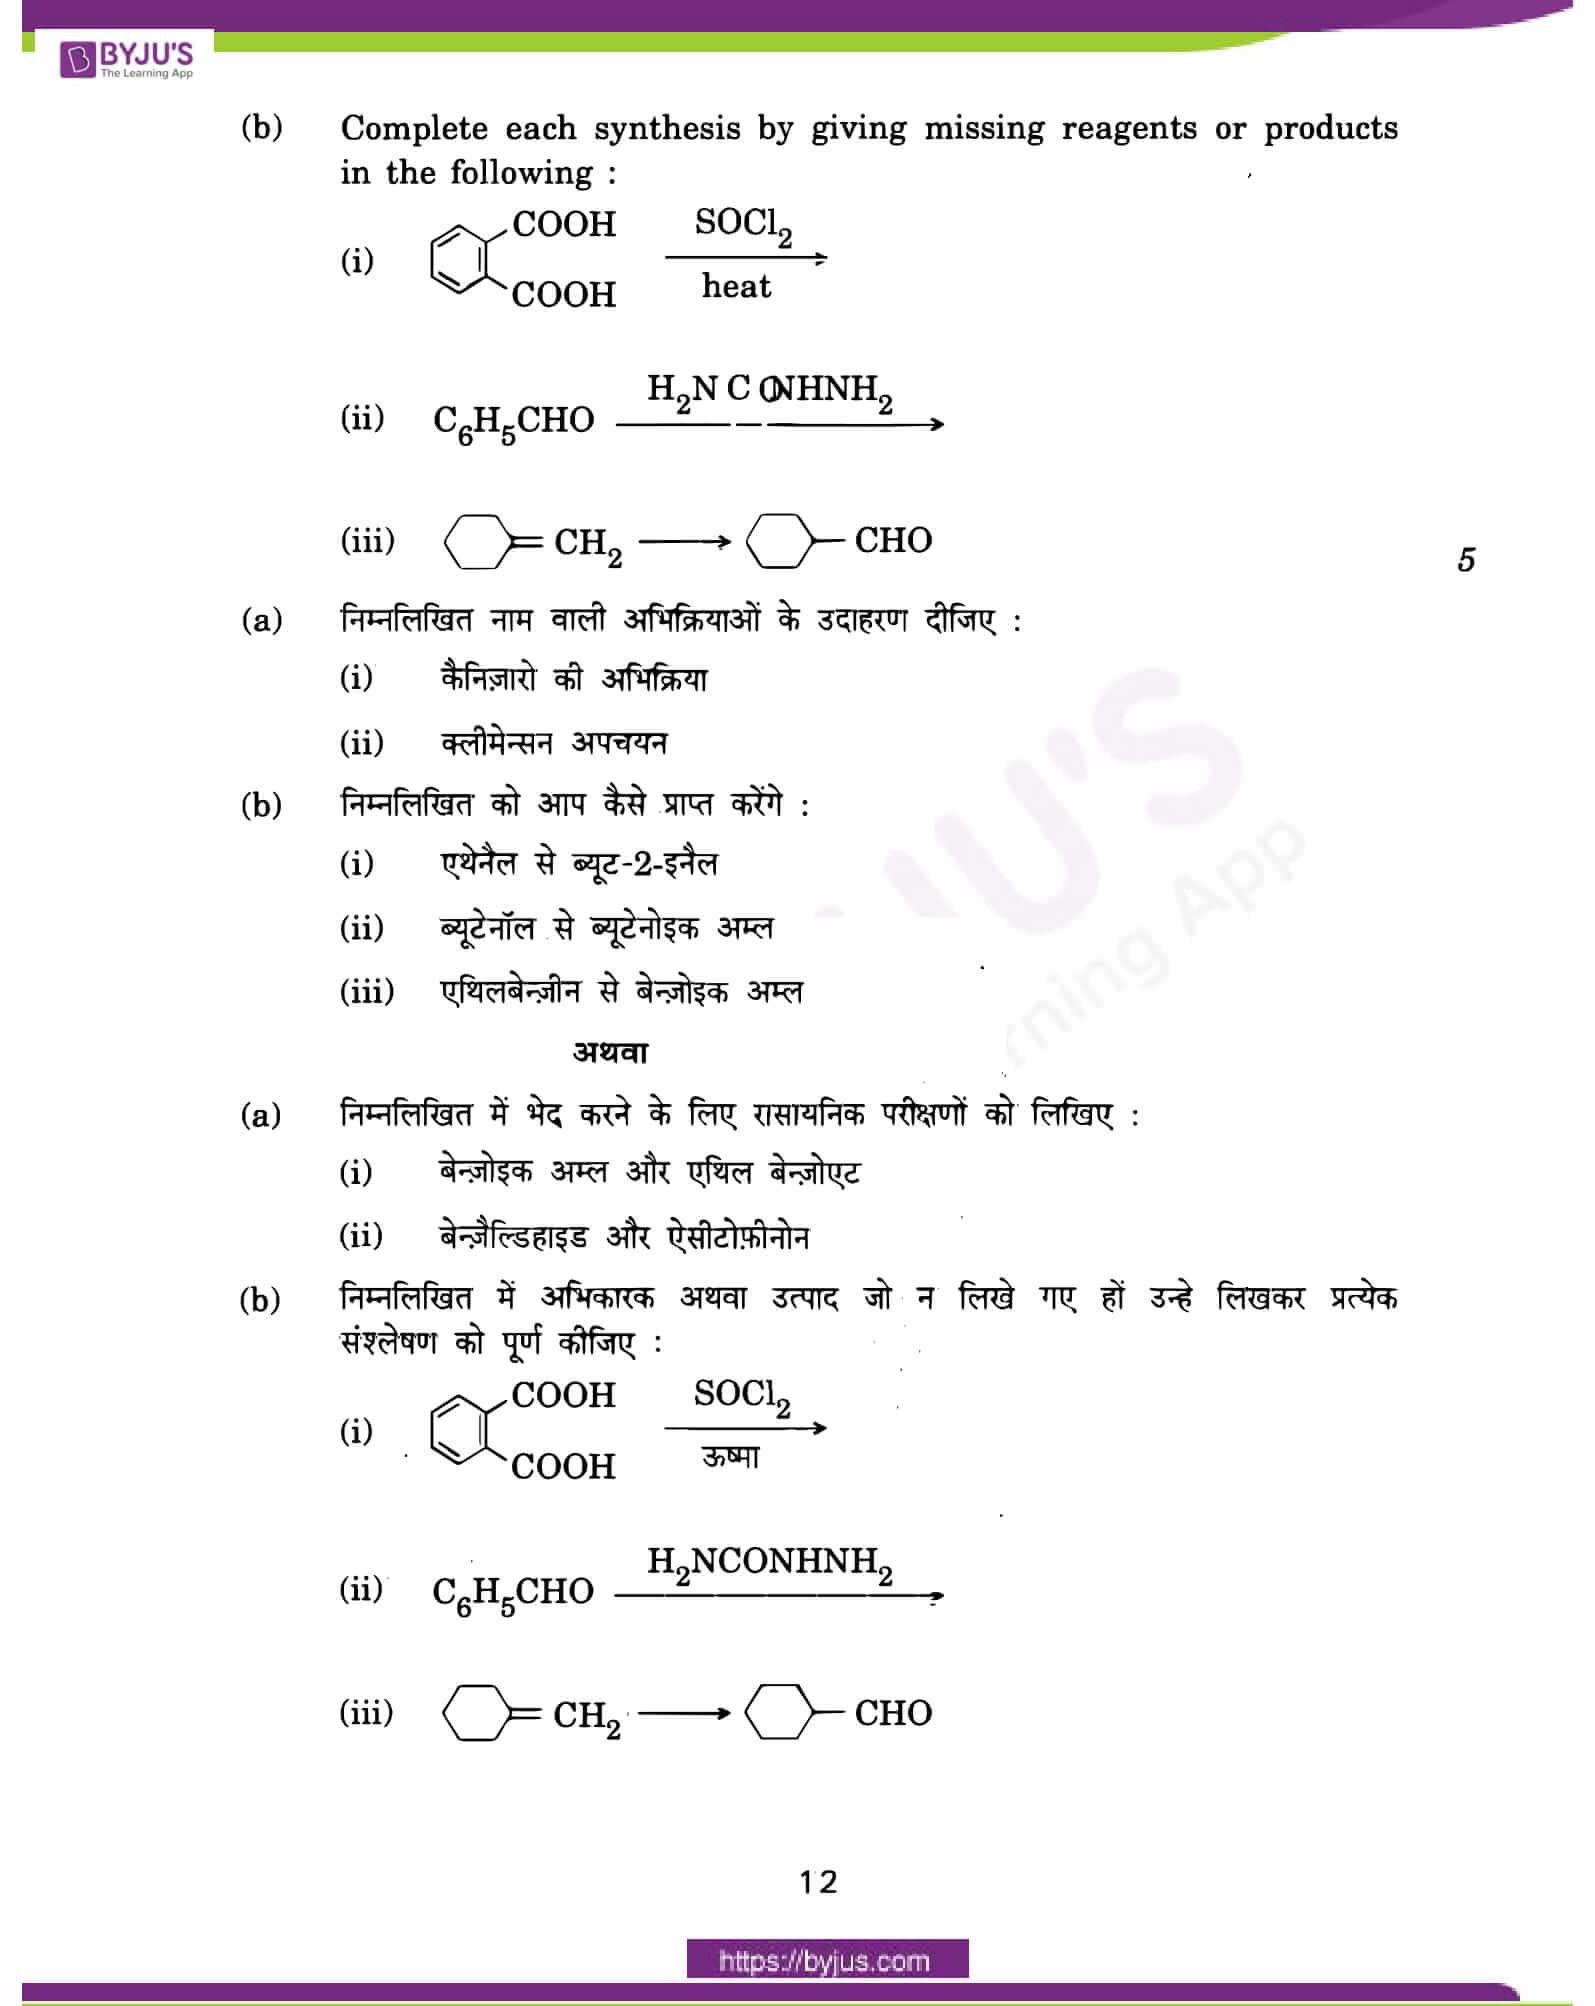 cbse class 12 qs paper 2013 chemistry set 1